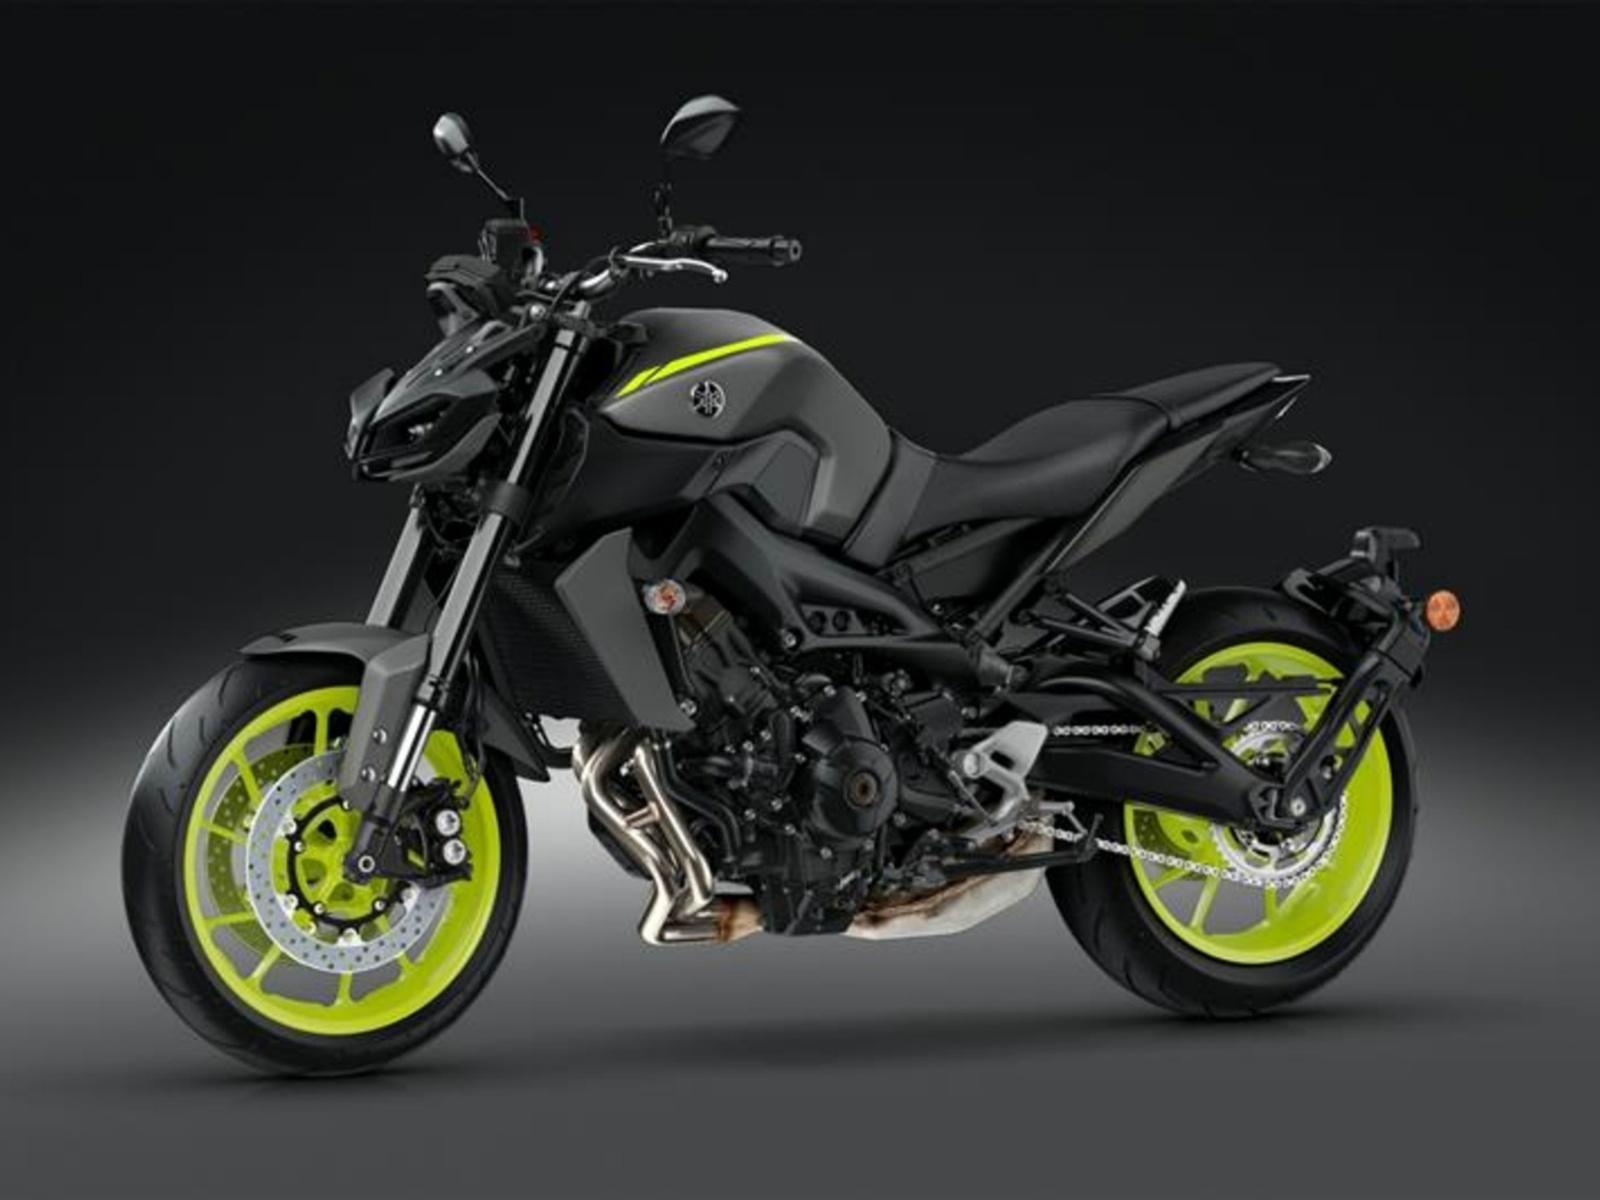 мотоцикл, yamaha mt - 09, тёмный фон